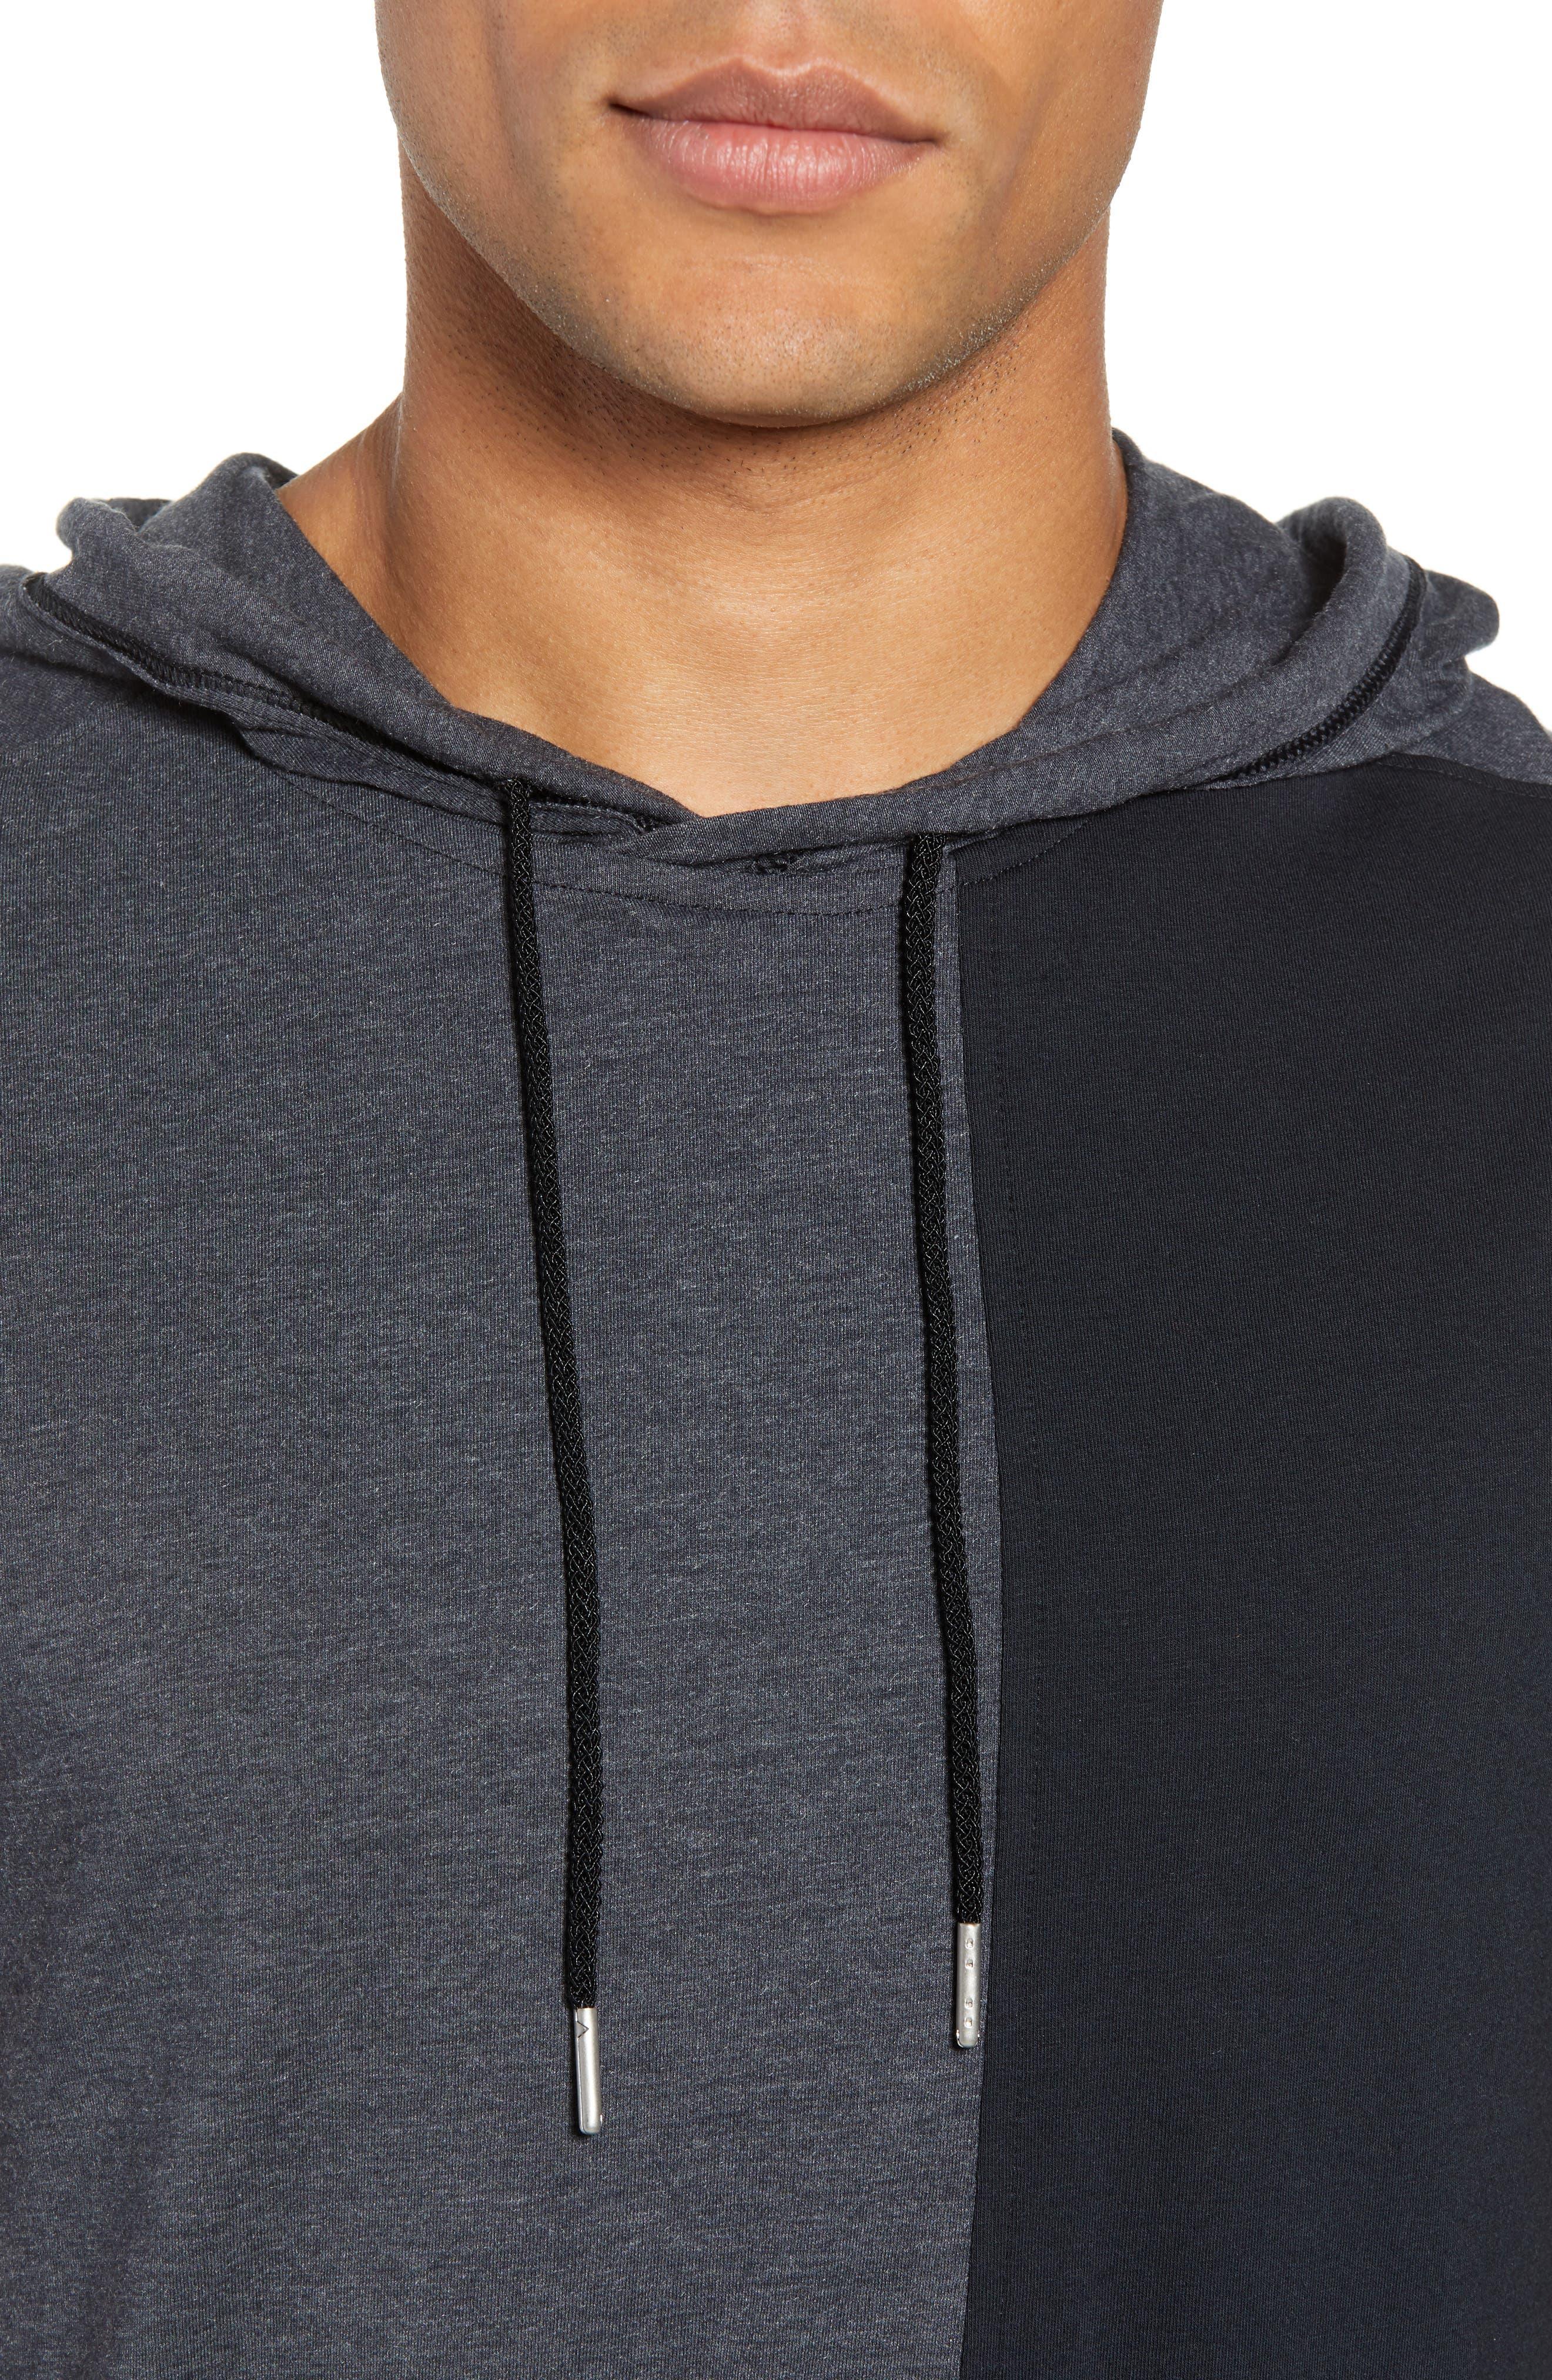 Pursuit Short Sleeve Hoodie,                             Alternate thumbnail 4, color,                             Black/ Black/ Stealth Gray